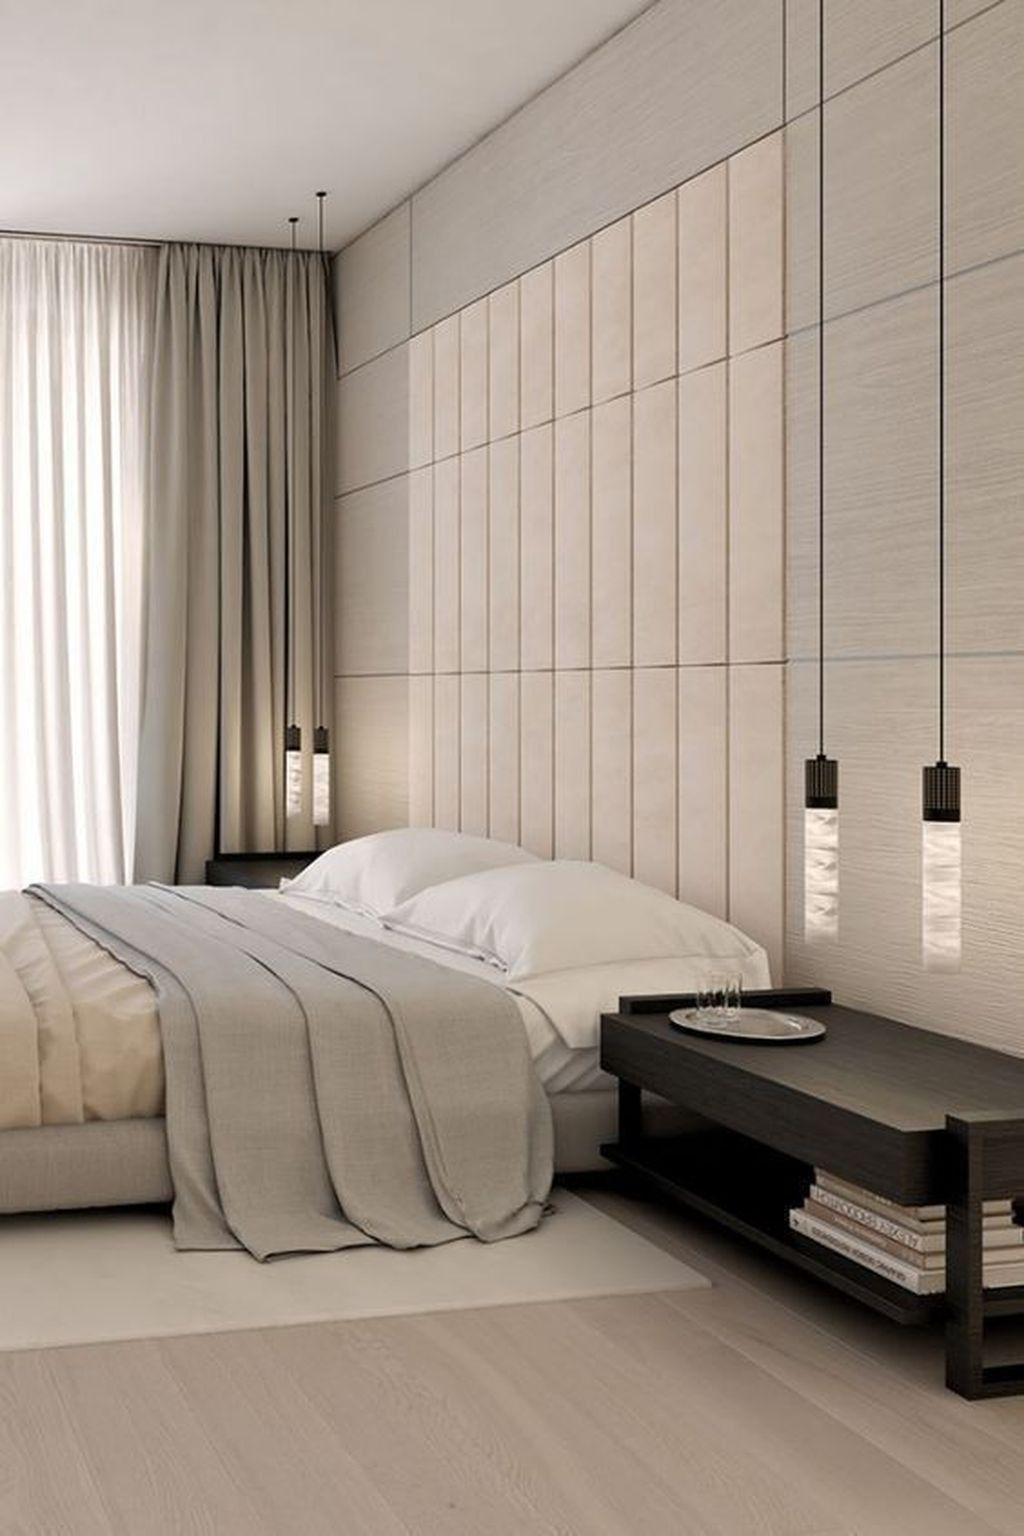 Modern Minimalist Bedroom Design 5 in 5  Modern master